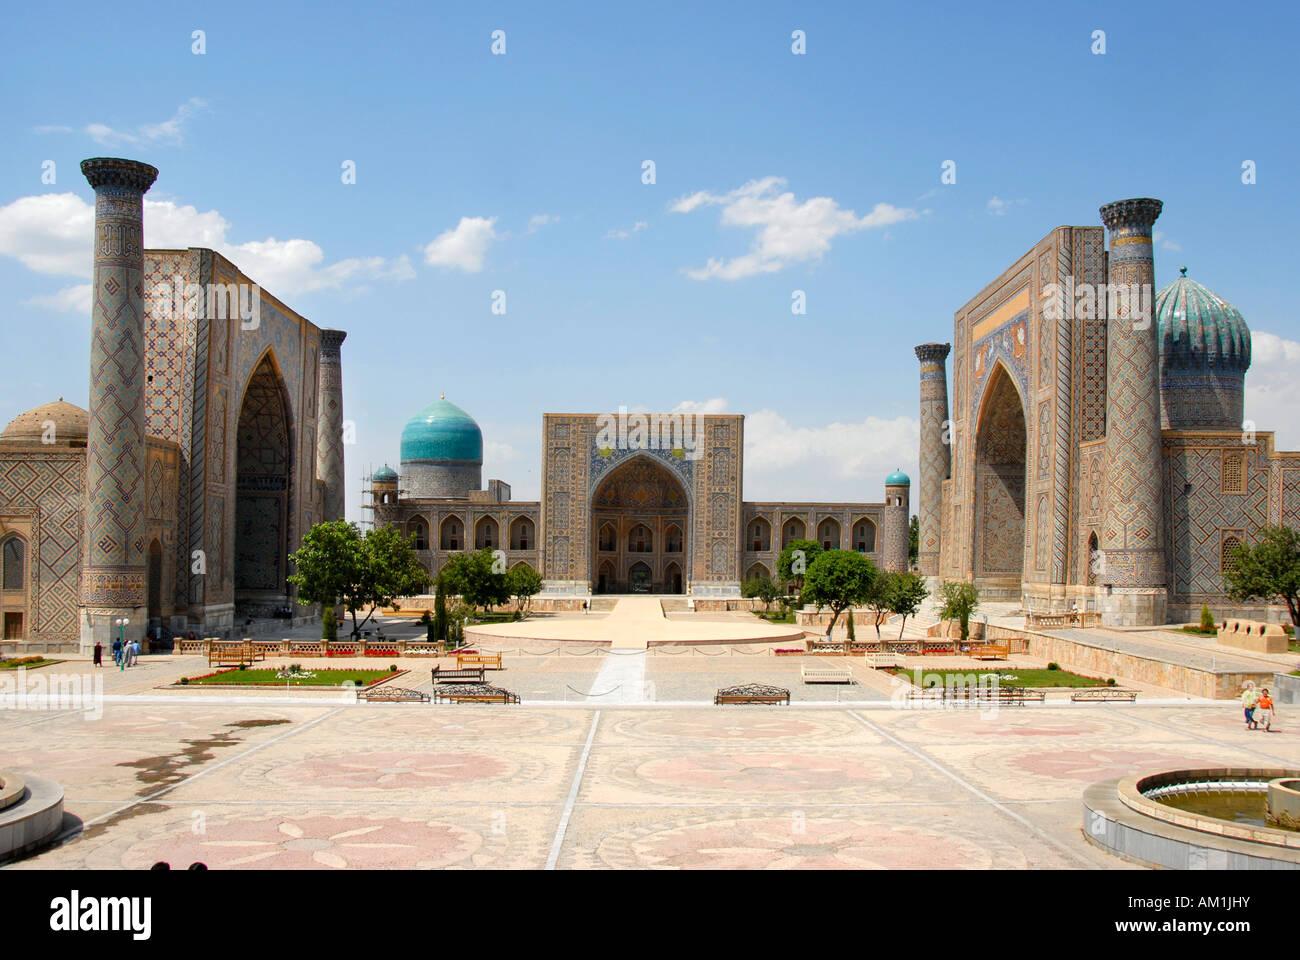 Madrasah Ulugh Beg, Tilla-Kari and Sherdar Registan Samarkand Uzbekistan Stock Photo